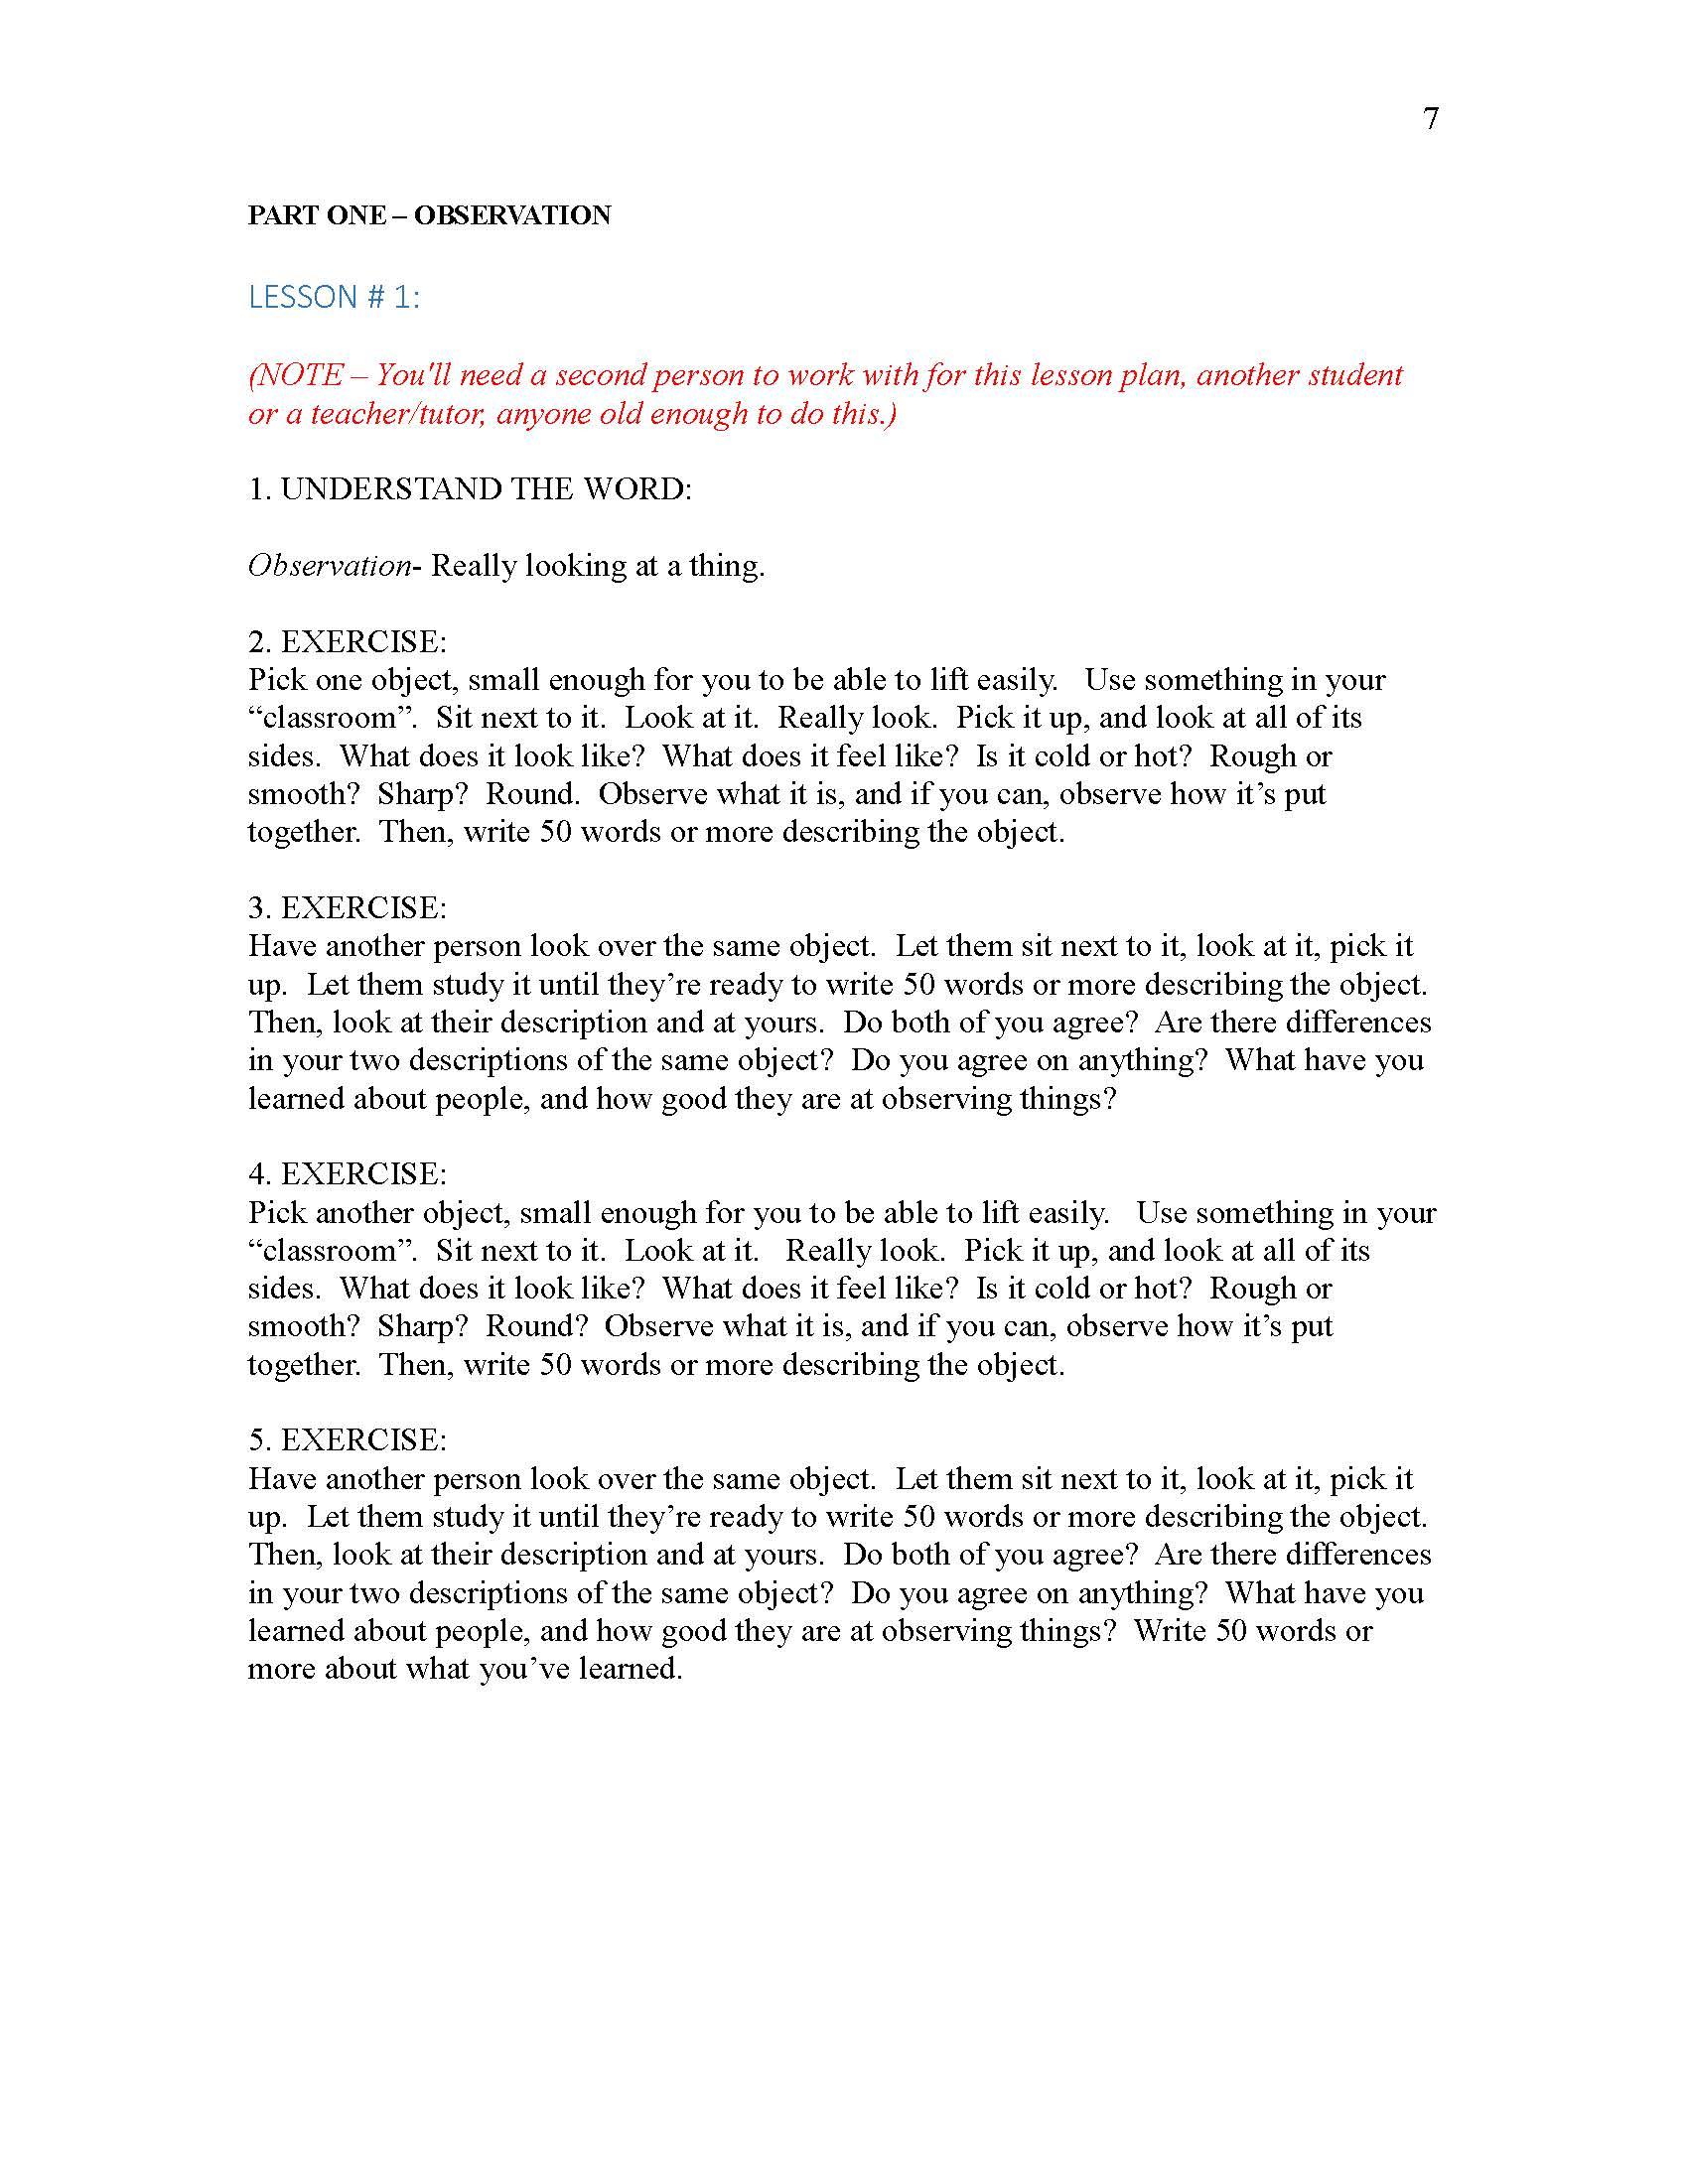 Step 4 Science 1 Science Basics_Page_08.jpg